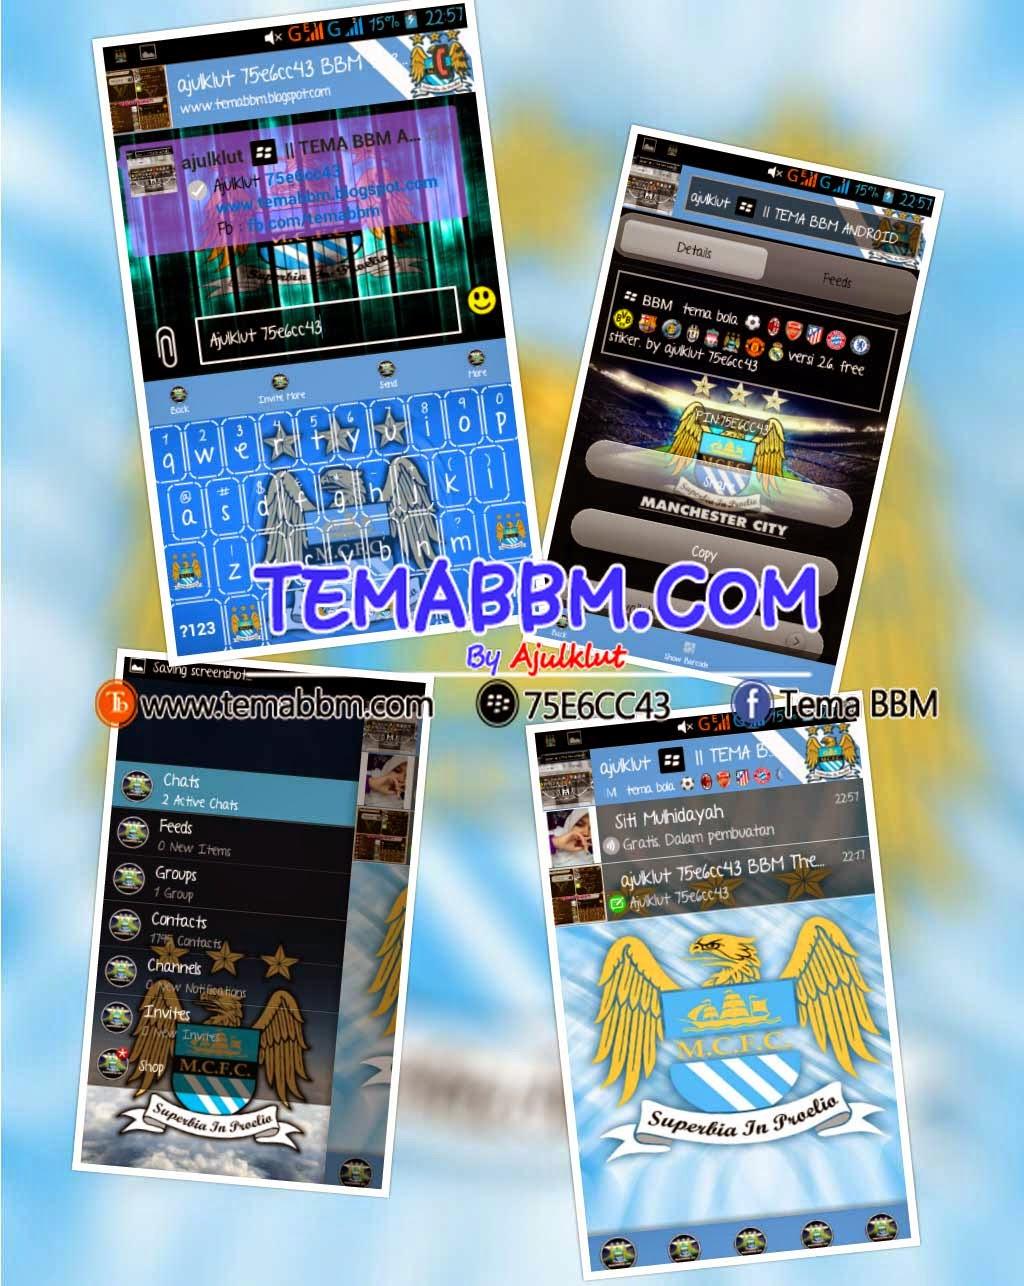 BBM MOD Manchester City